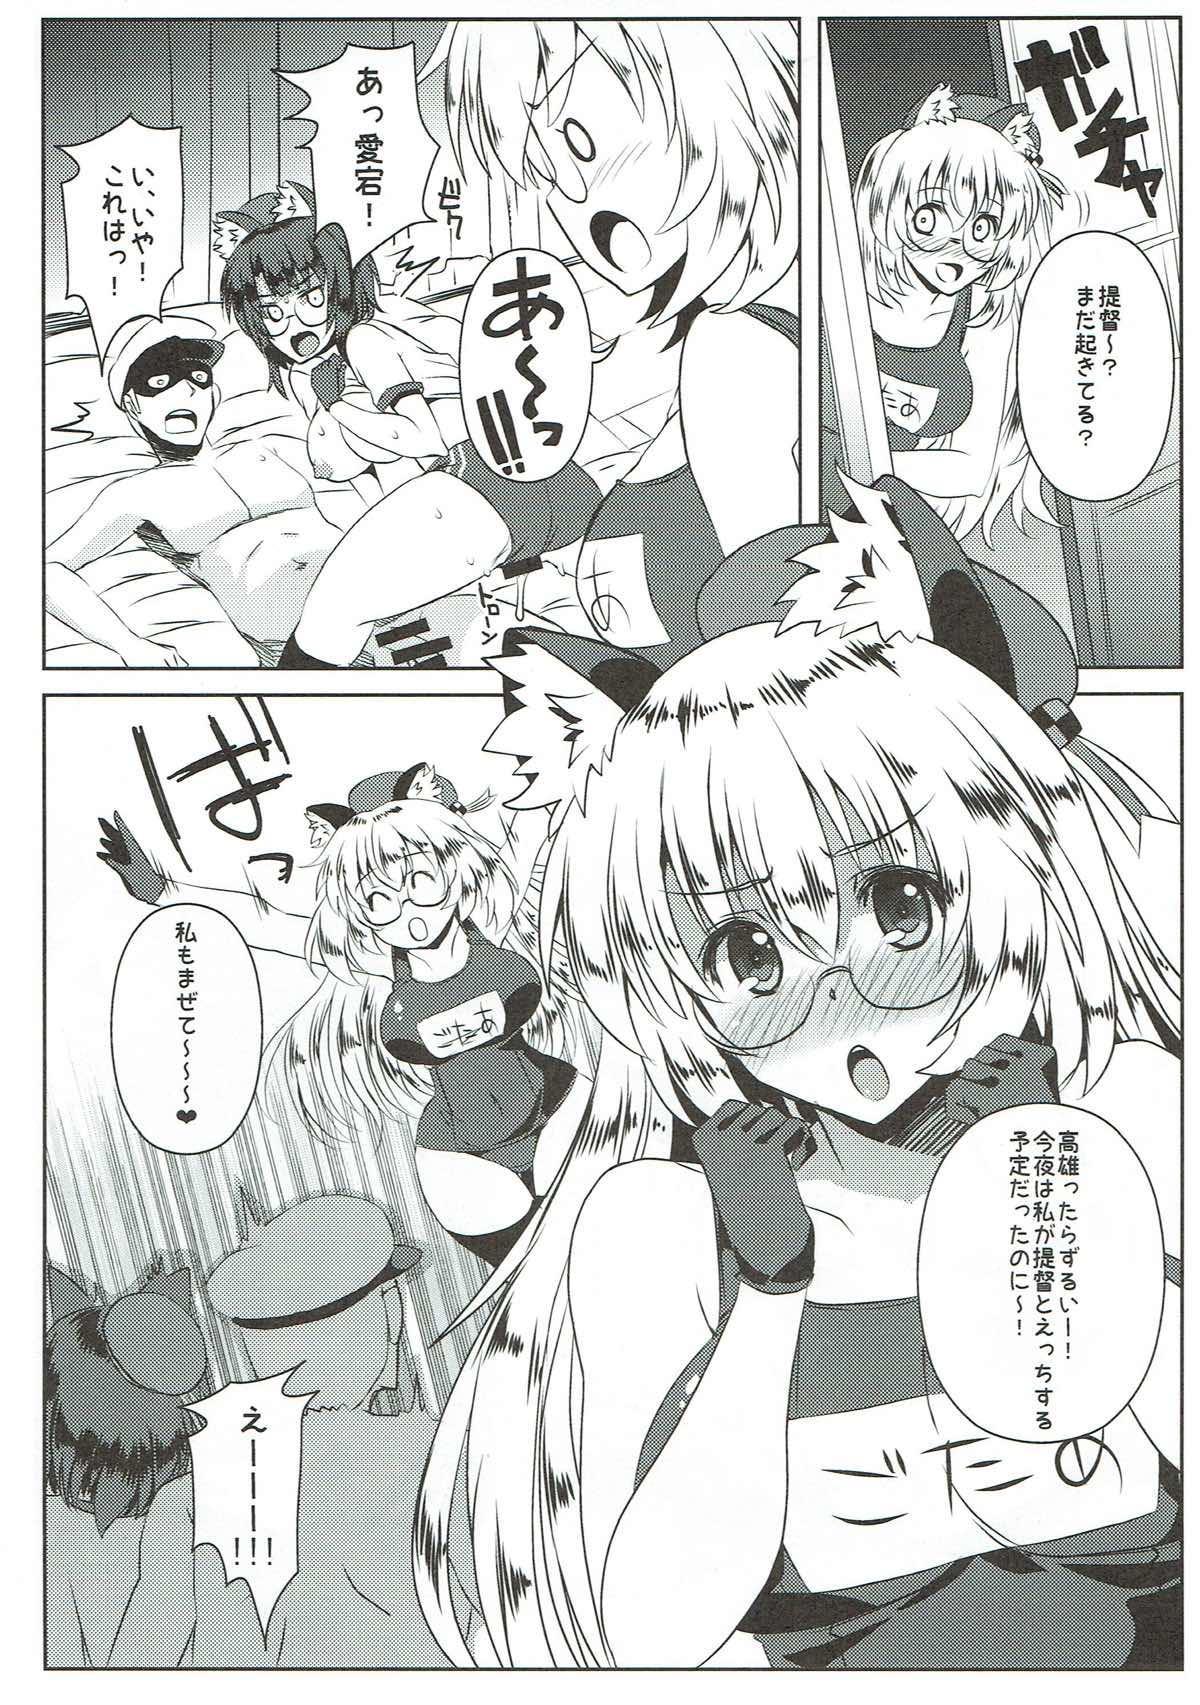 MegaNekoBlooSuku Atataka Oppai 5